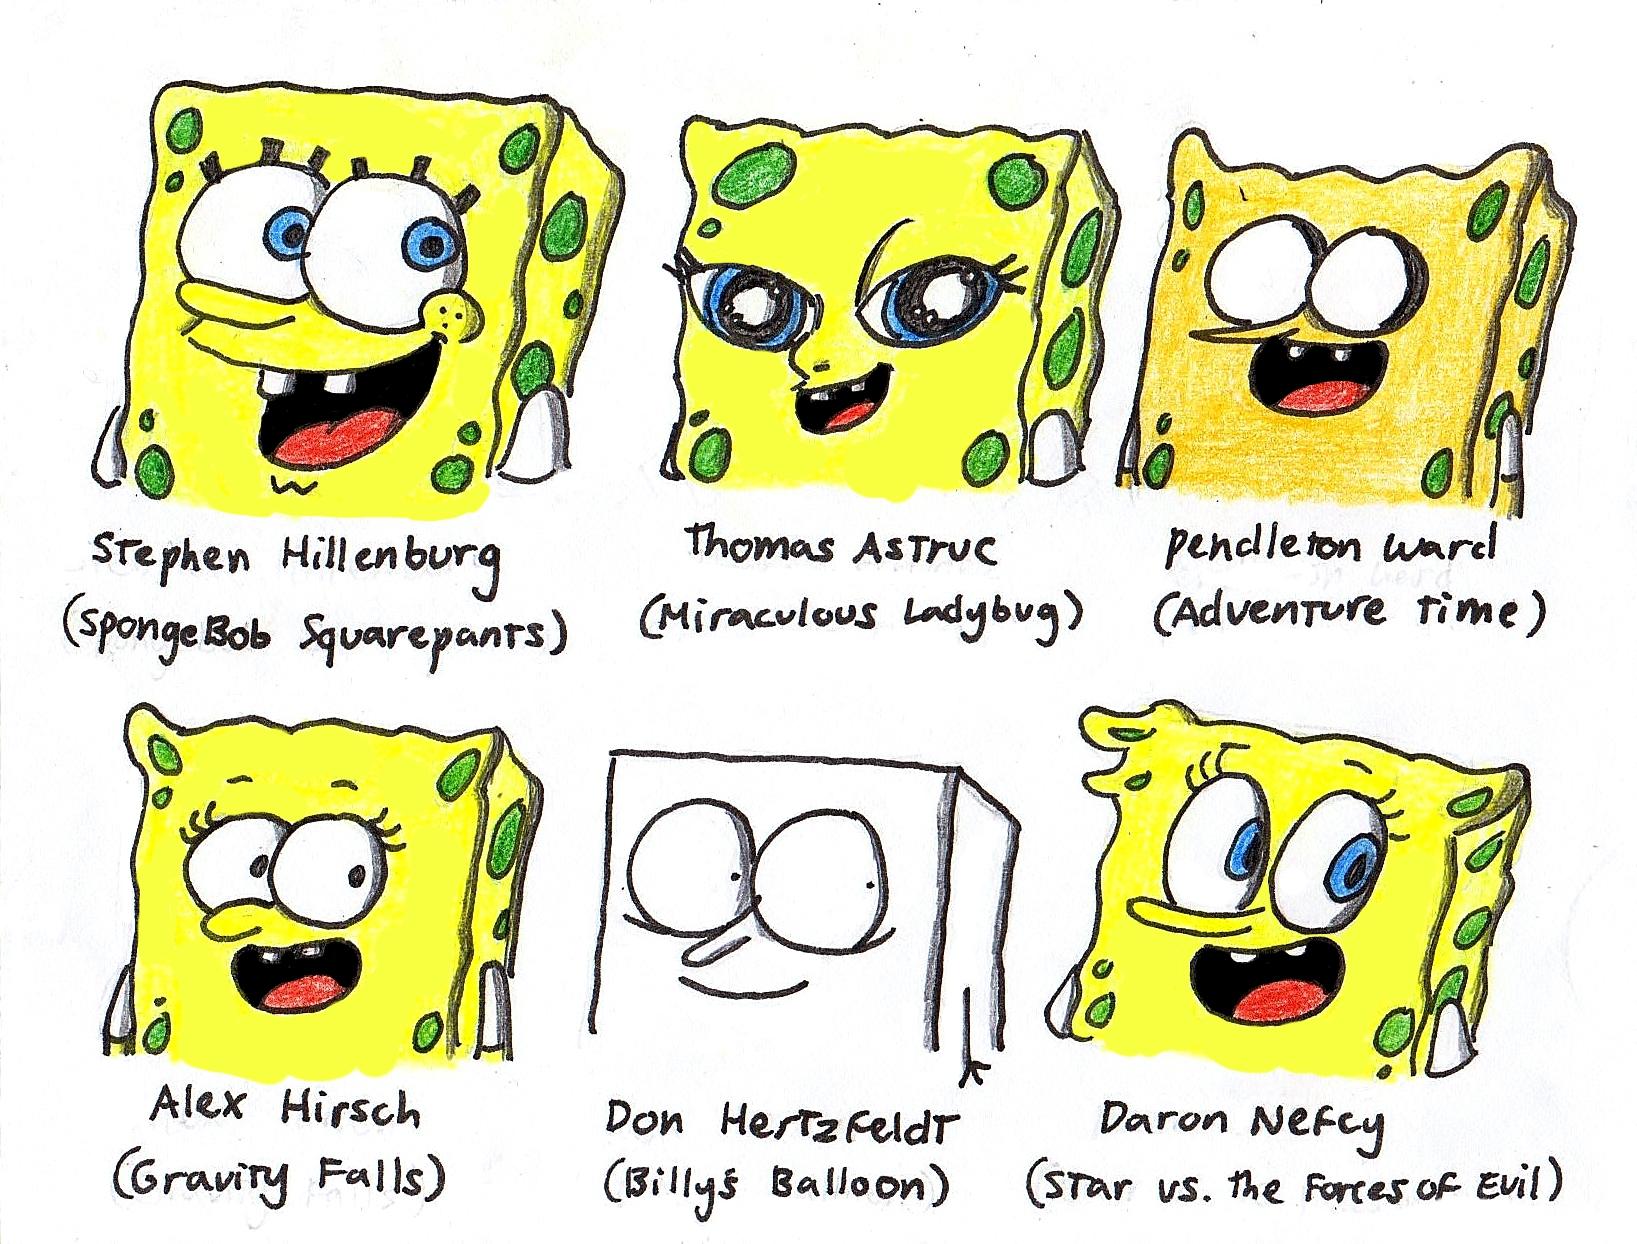 Spongebob in 6 different styles by finnjr63 on deviantart for Modern drawing styles